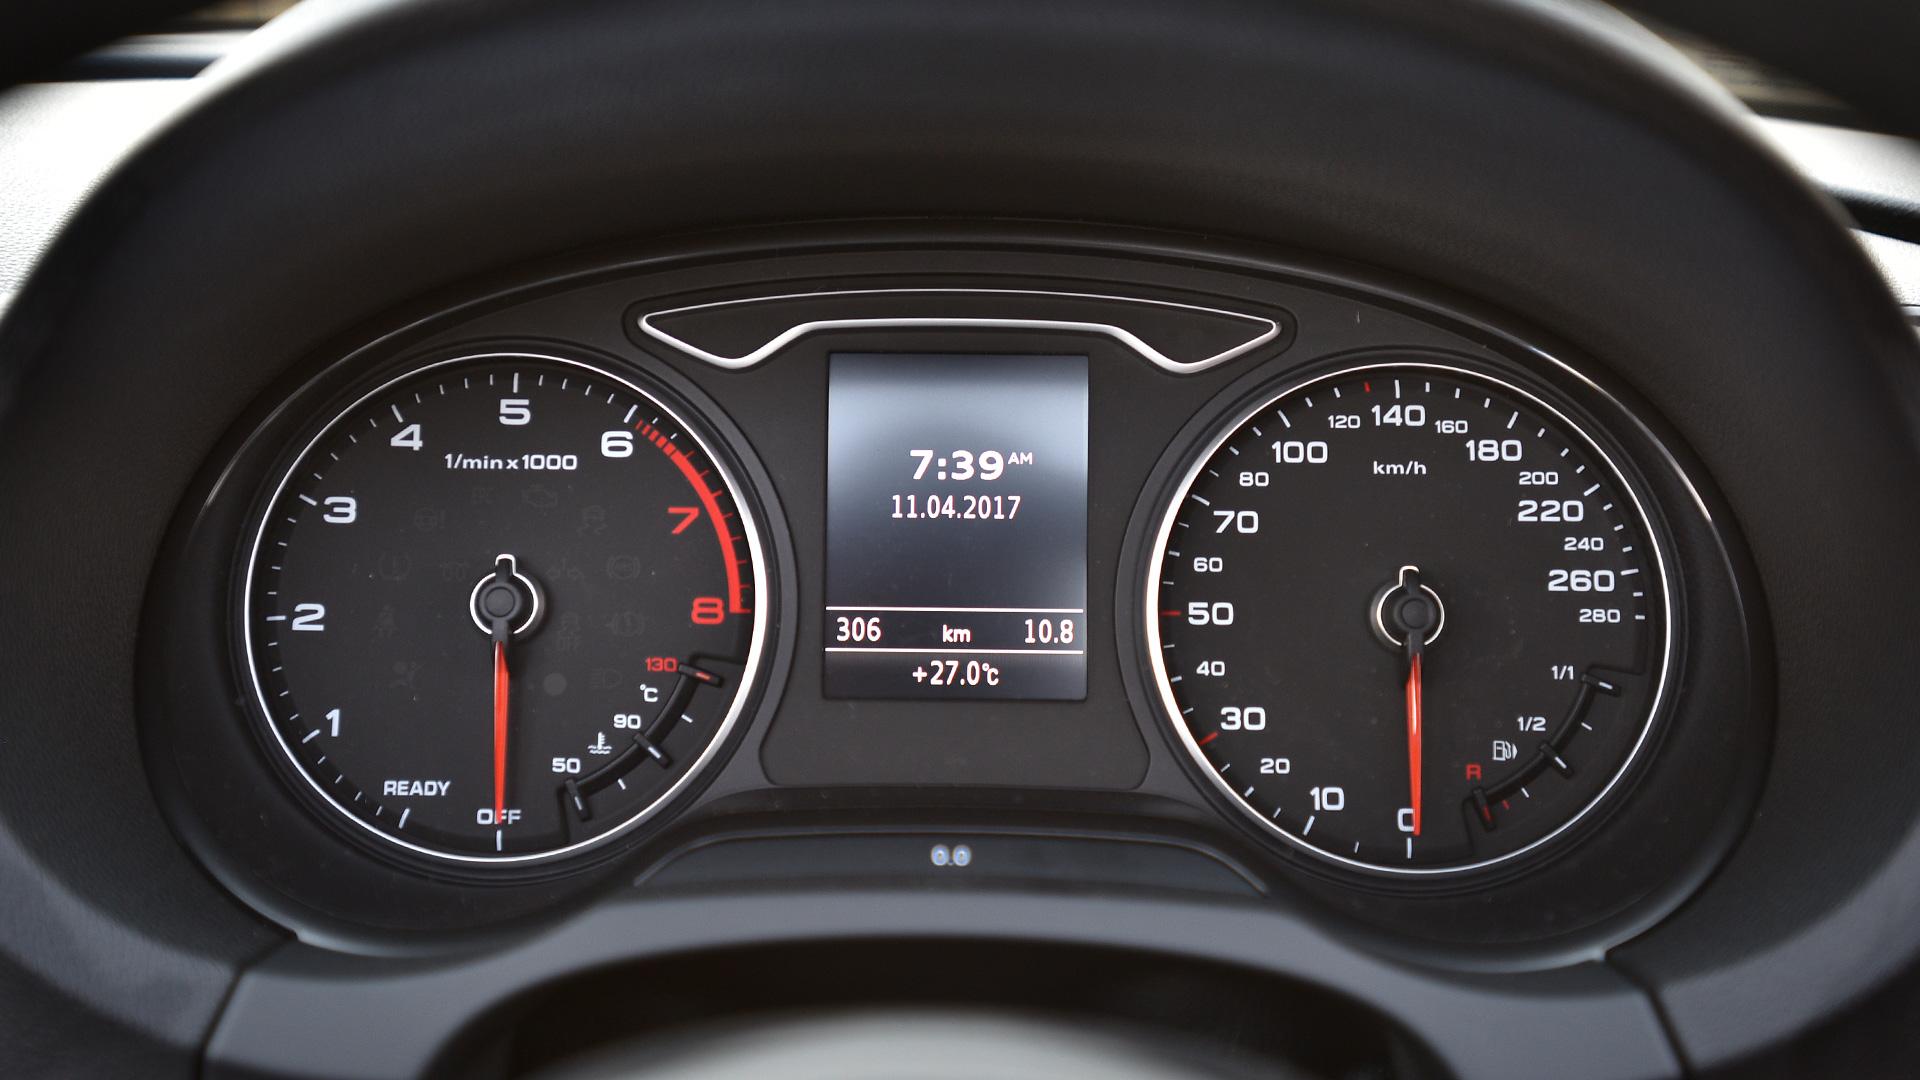 Audi A3 Cabriolet 2017 35 TFSI Interior